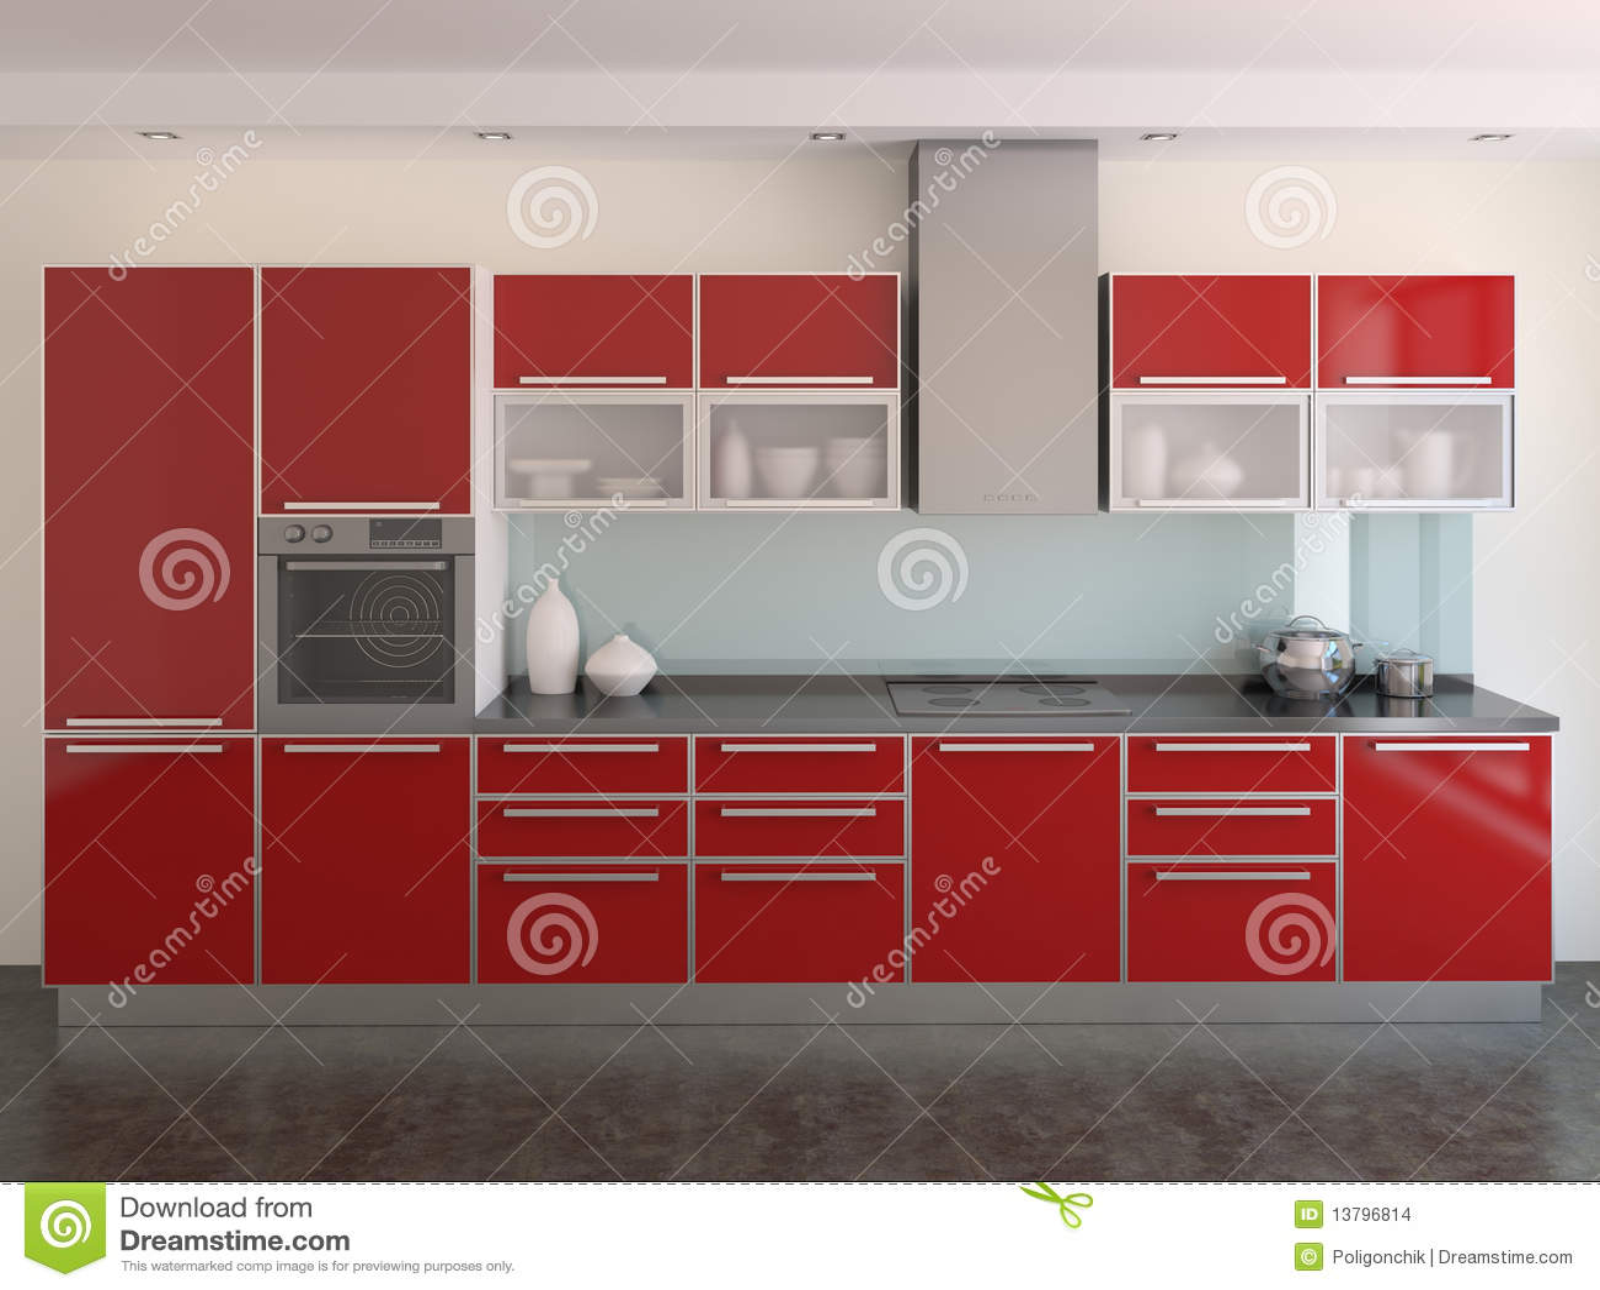 Cuisine Design Contemporain : Cuisine Rouge Moderne Images stock  Image 13796814